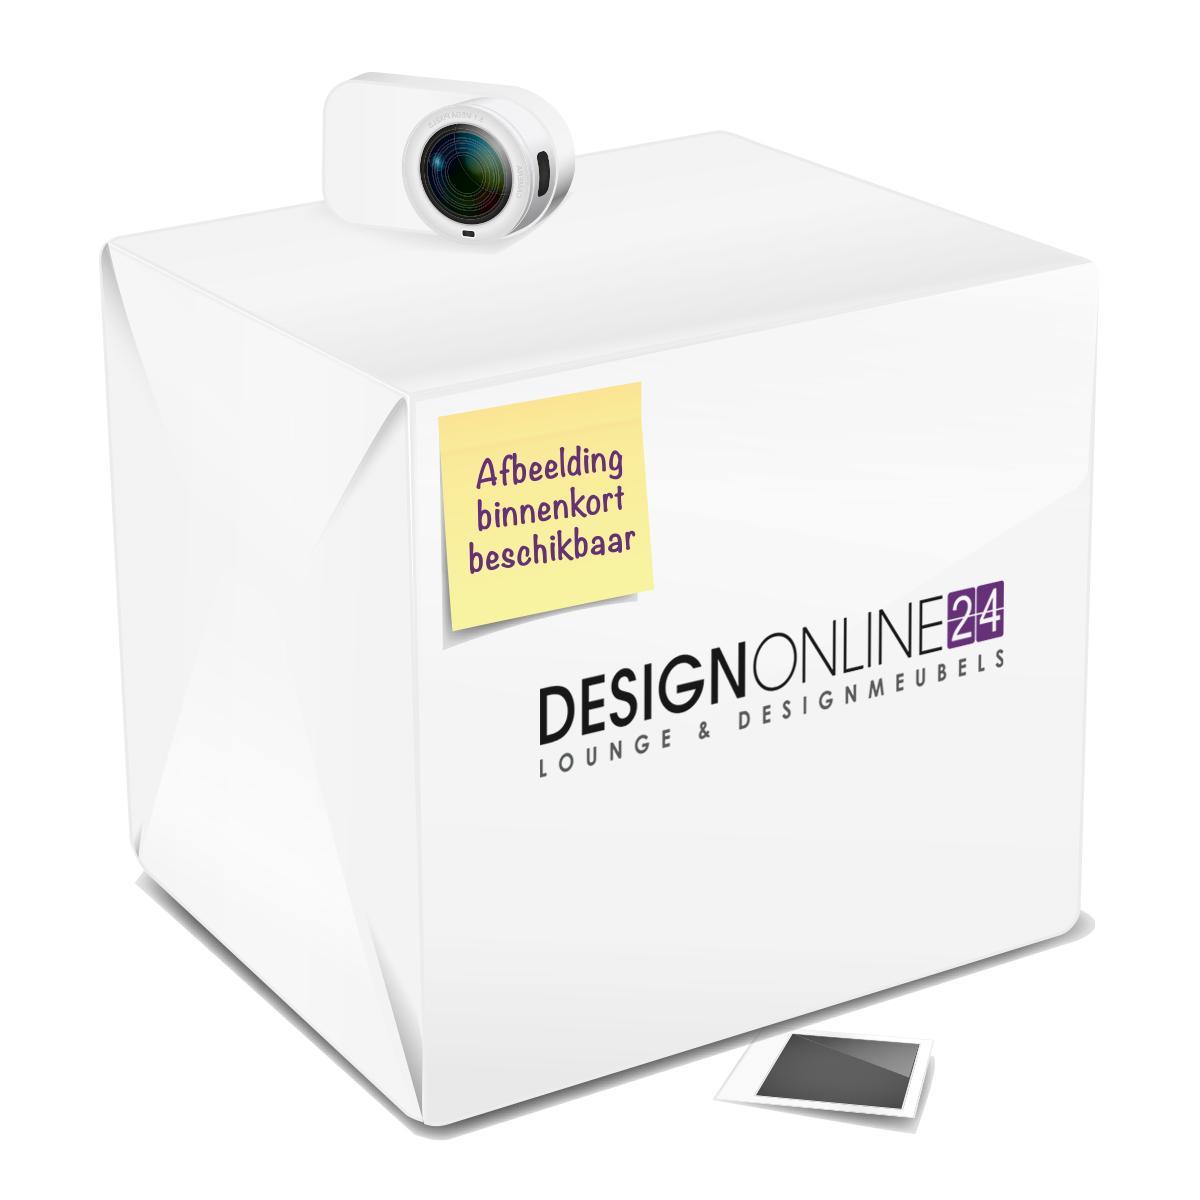 Innovation Slaapbank Splitback Armleuningen - Styletto Poten Donker - Coastal Sandstone 537